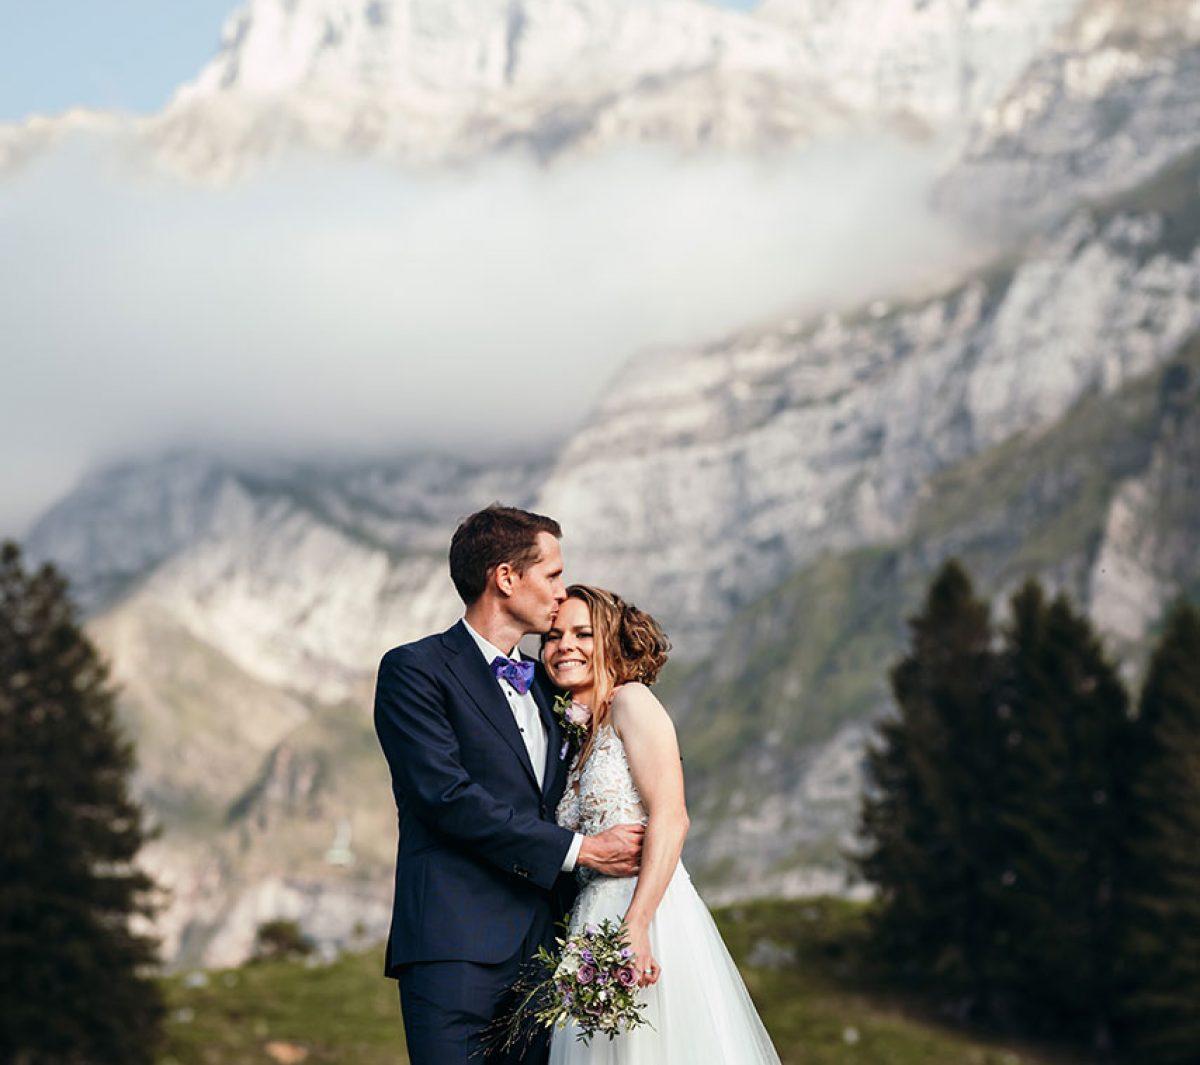 Celina & Markus